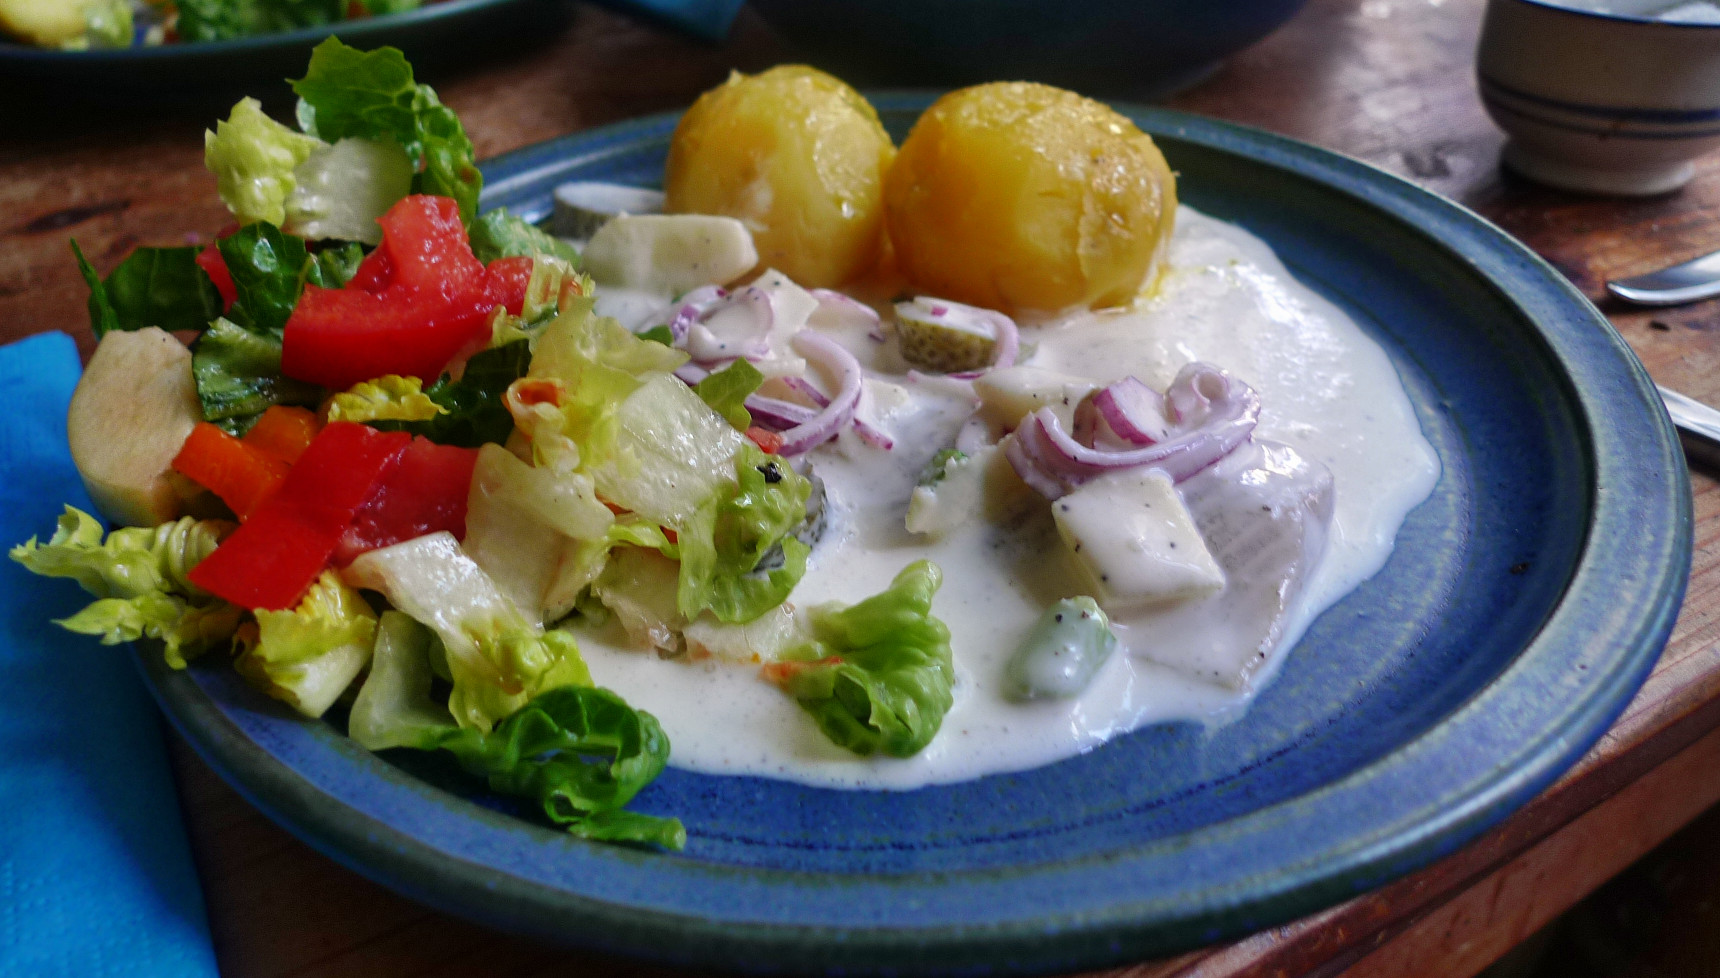 Marinierter Hering,Kartoffeln,Salat, - 14.4.15   (13)